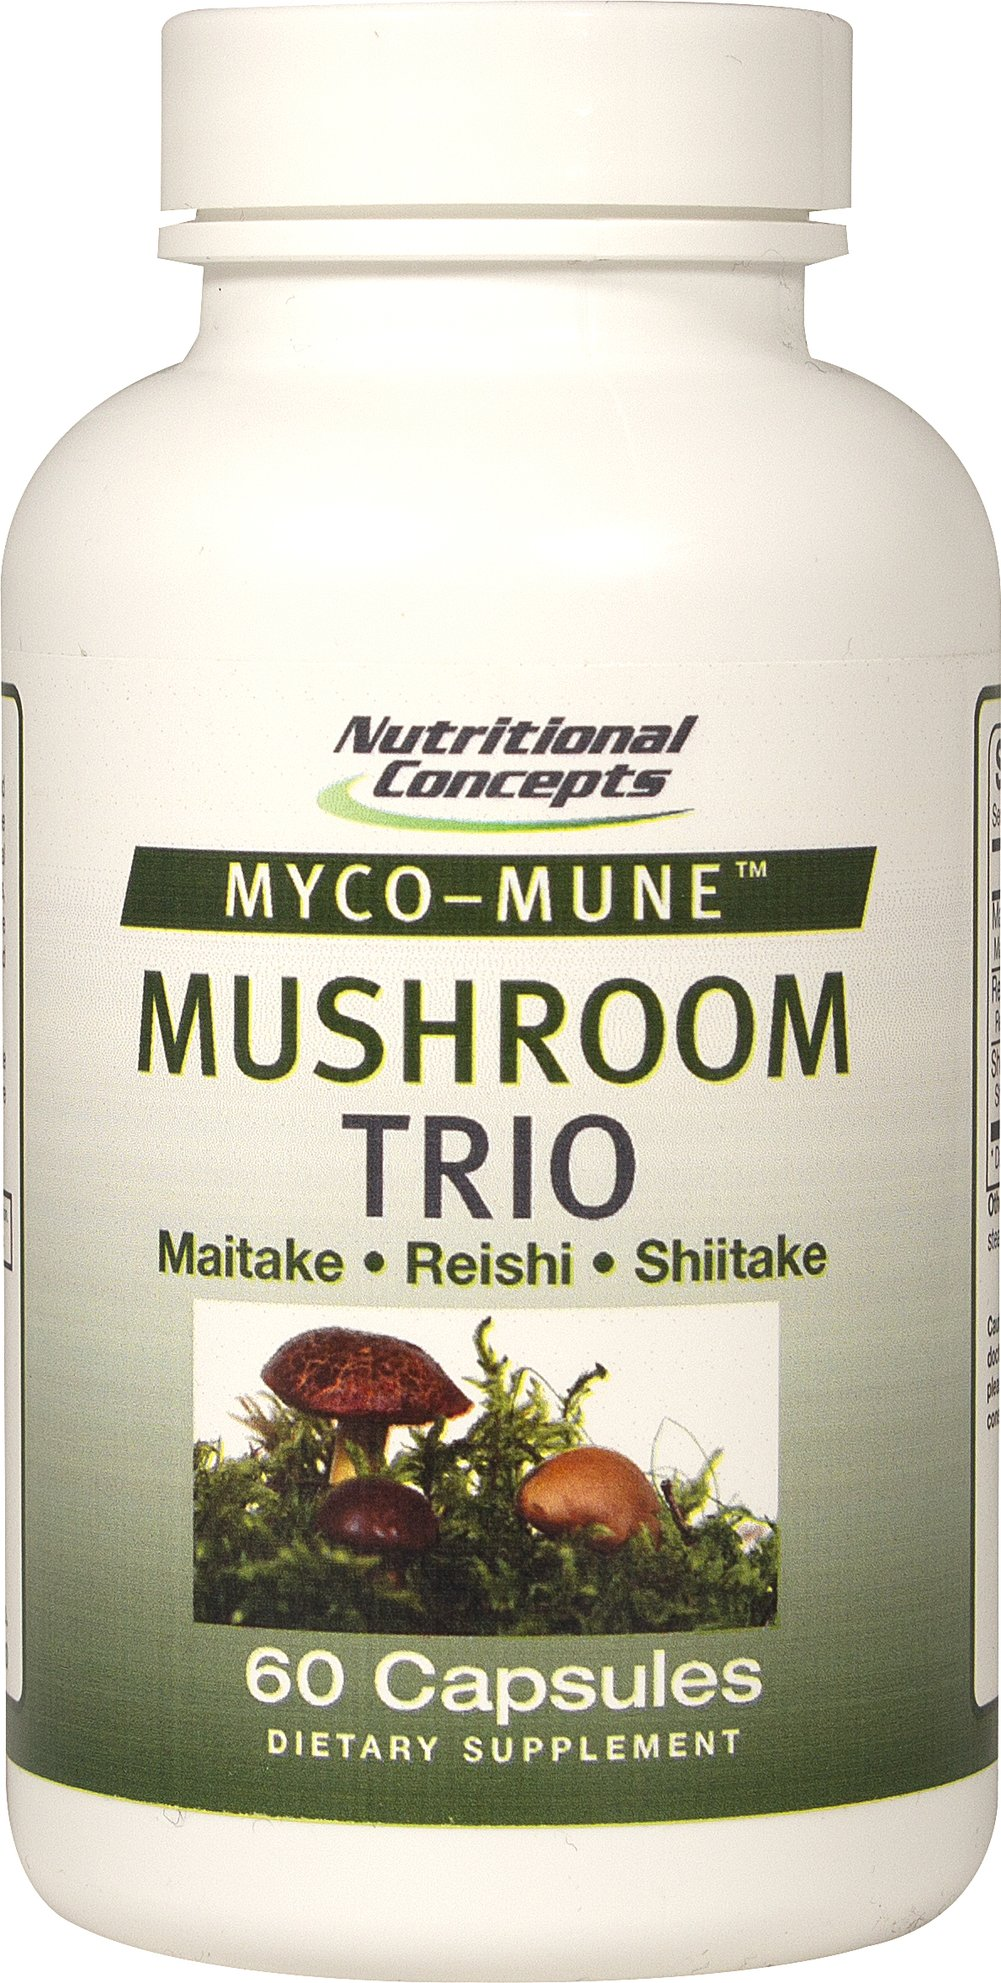 Myco-Mune™ Mushroom Trio Maitake, Reishi, Shiitake 60